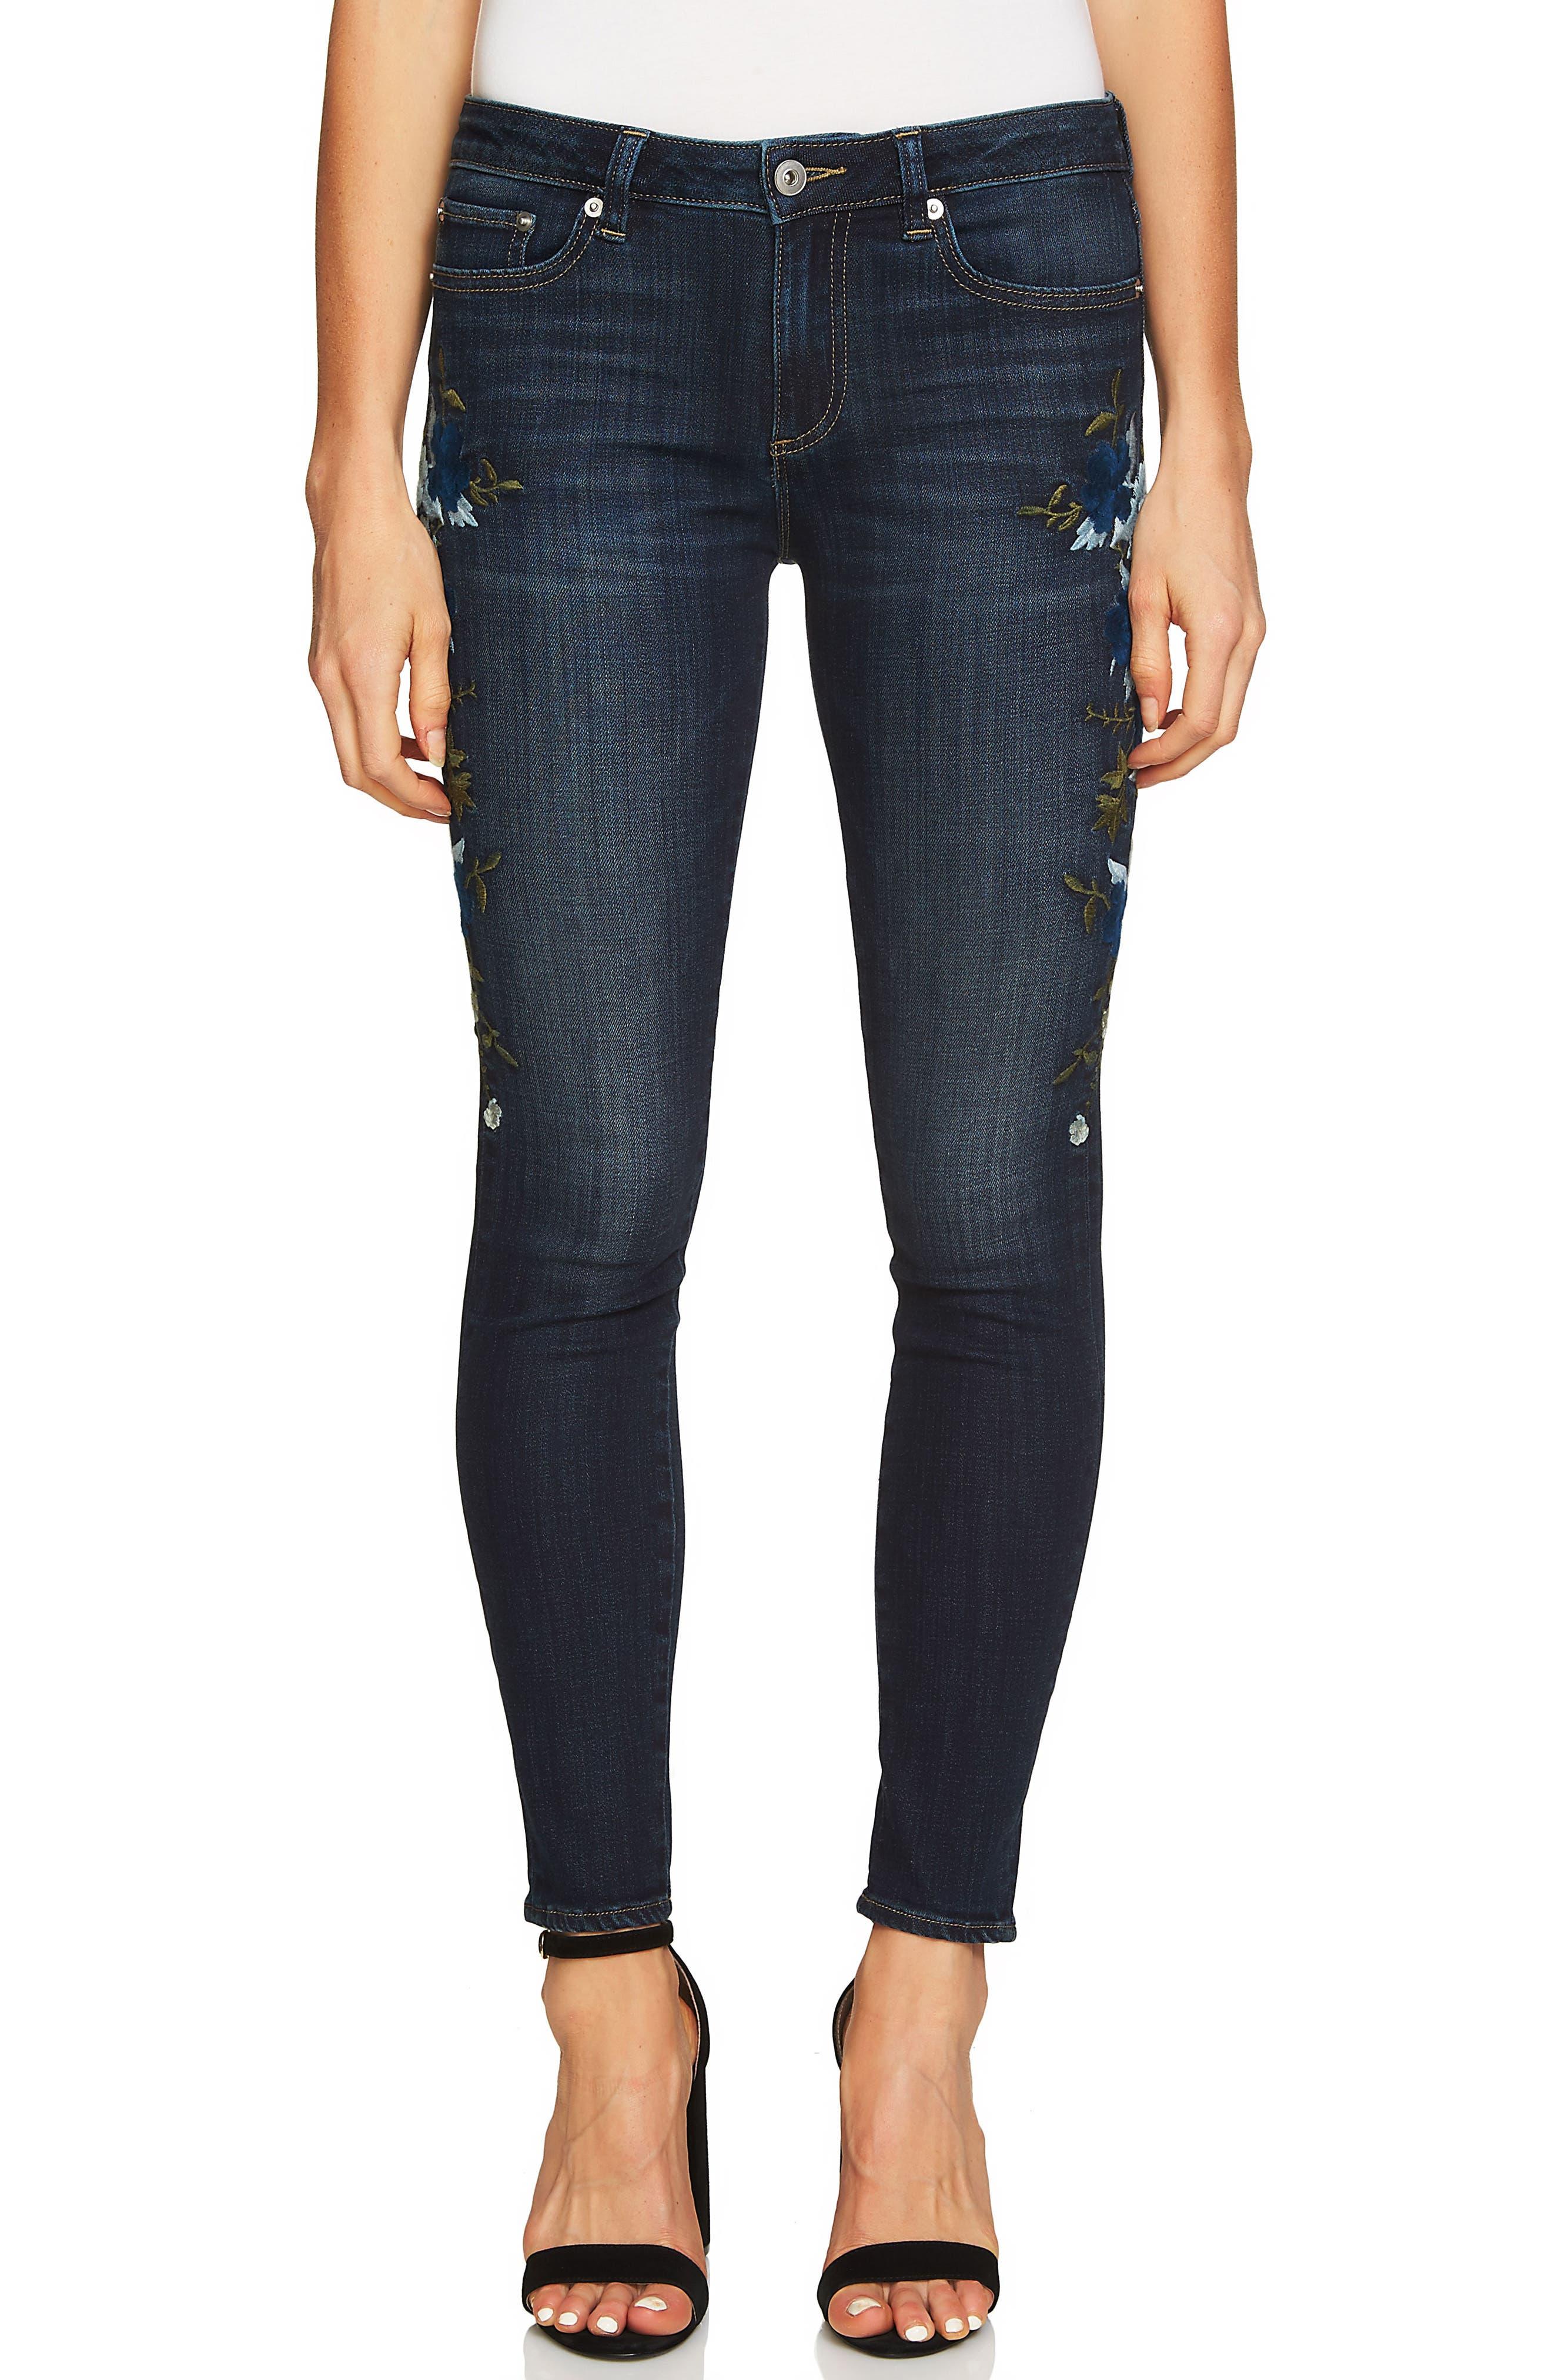 Indigo Denim Floral Embroidered Jeans,                         Main,                         color, Dark Authentic Blue